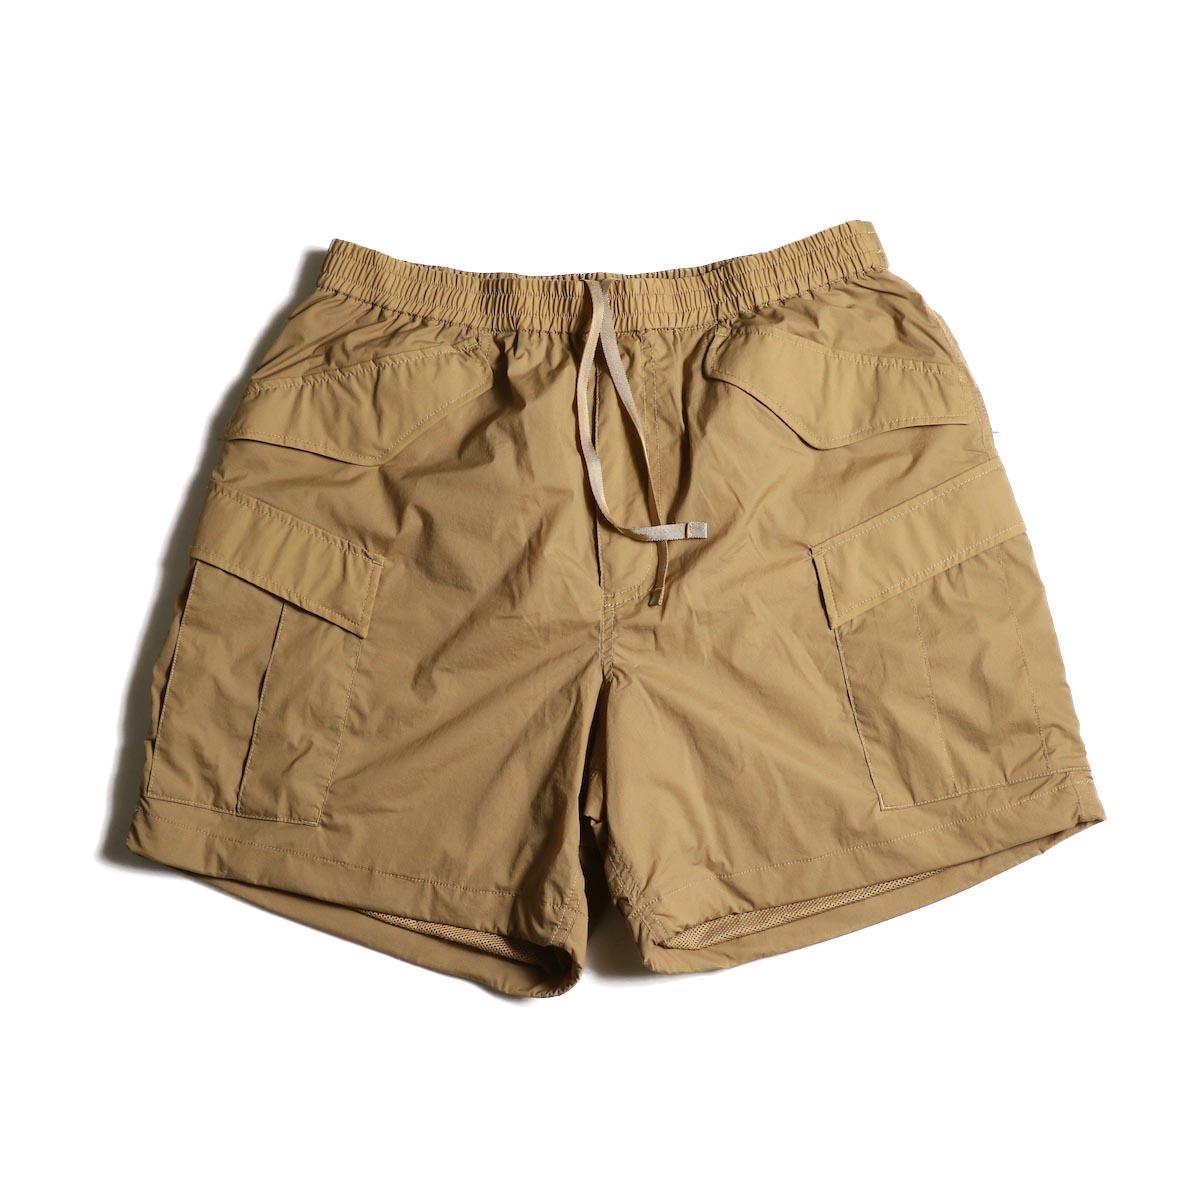 DAIWA PIER39 / Micro Rip-Stop Easy 6P Shorts (Tan)正面